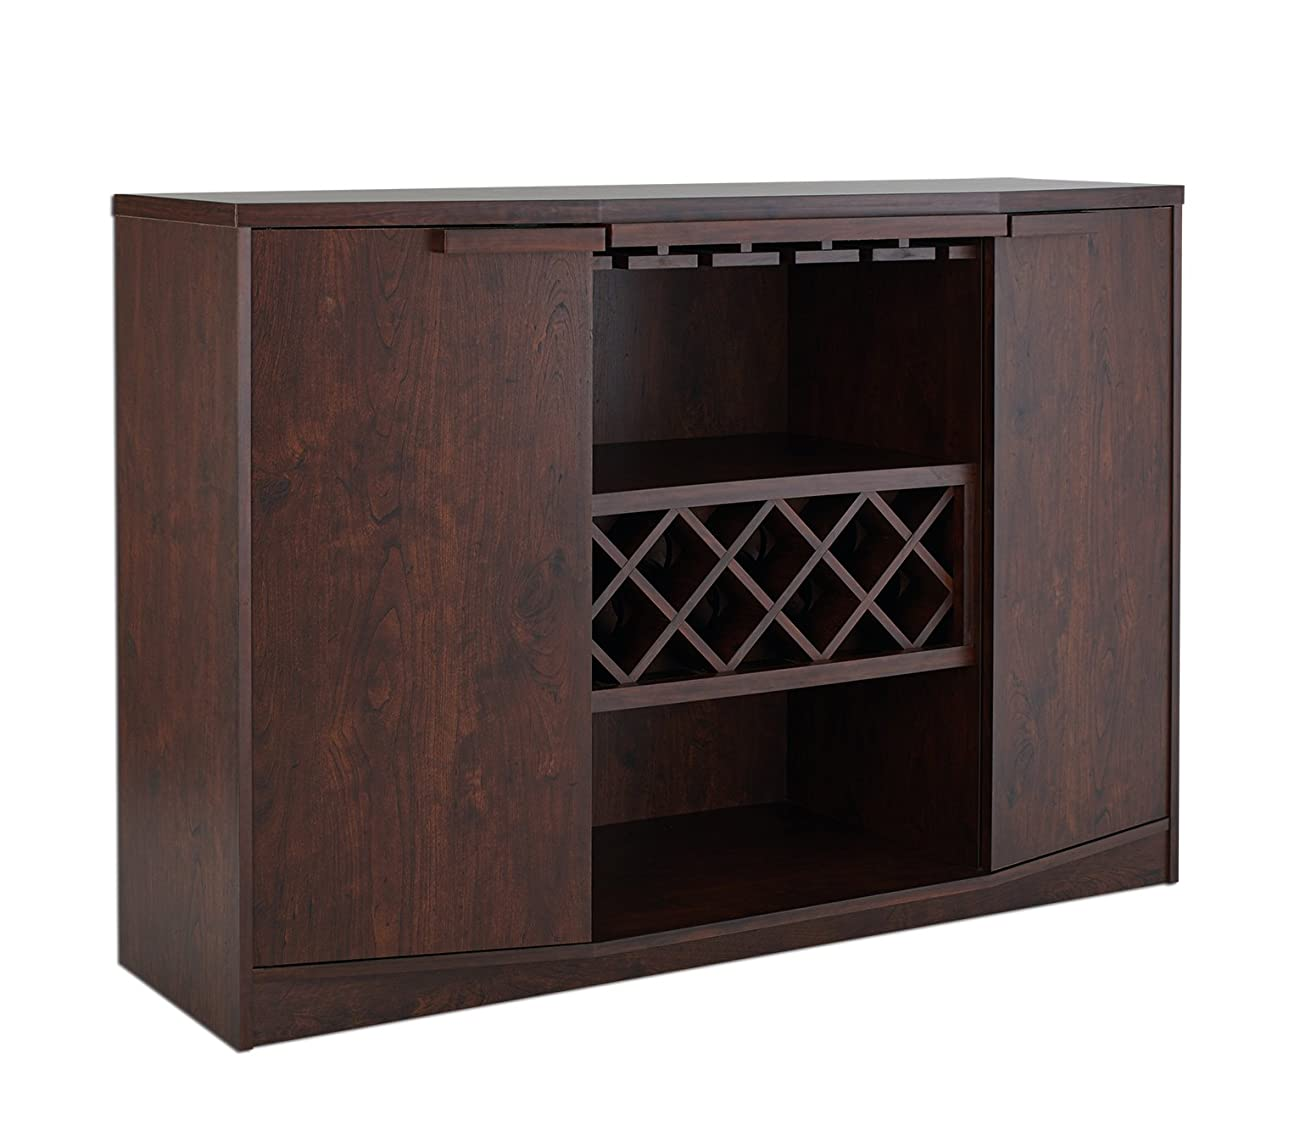 ioHOMES Annadel Wine Cabinet Buffet, Vintage Walnut 0